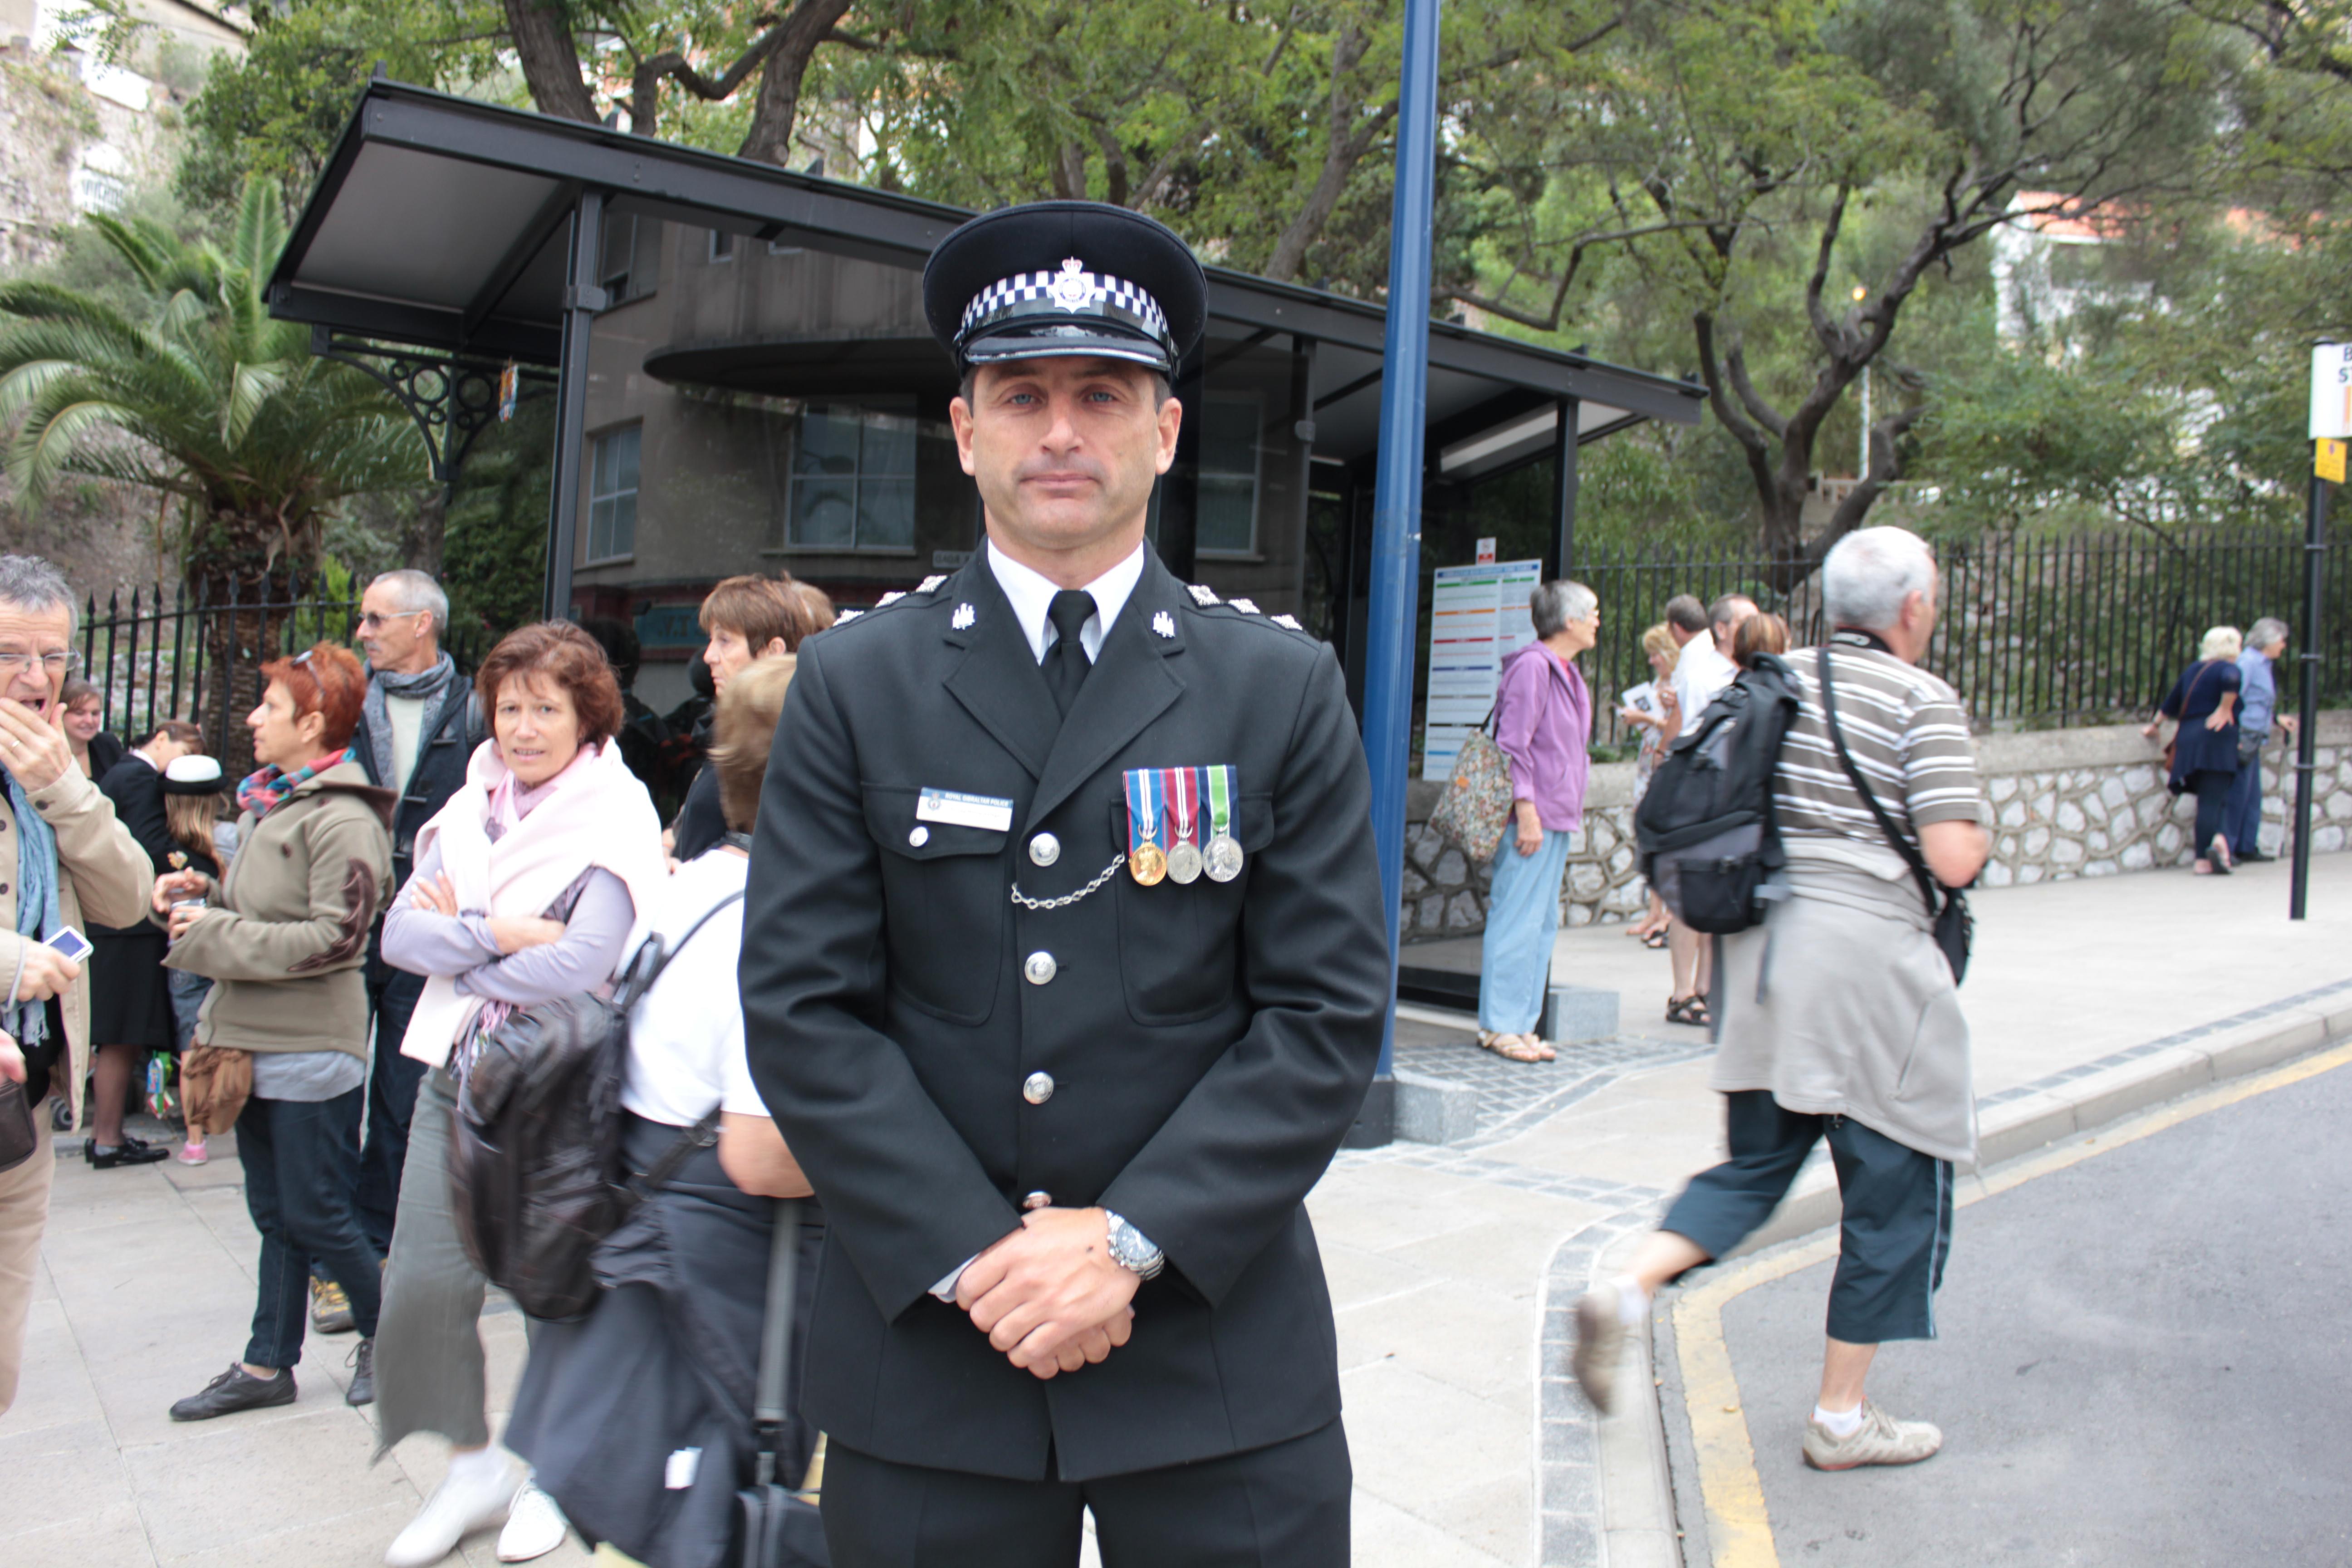 Inspector uniform